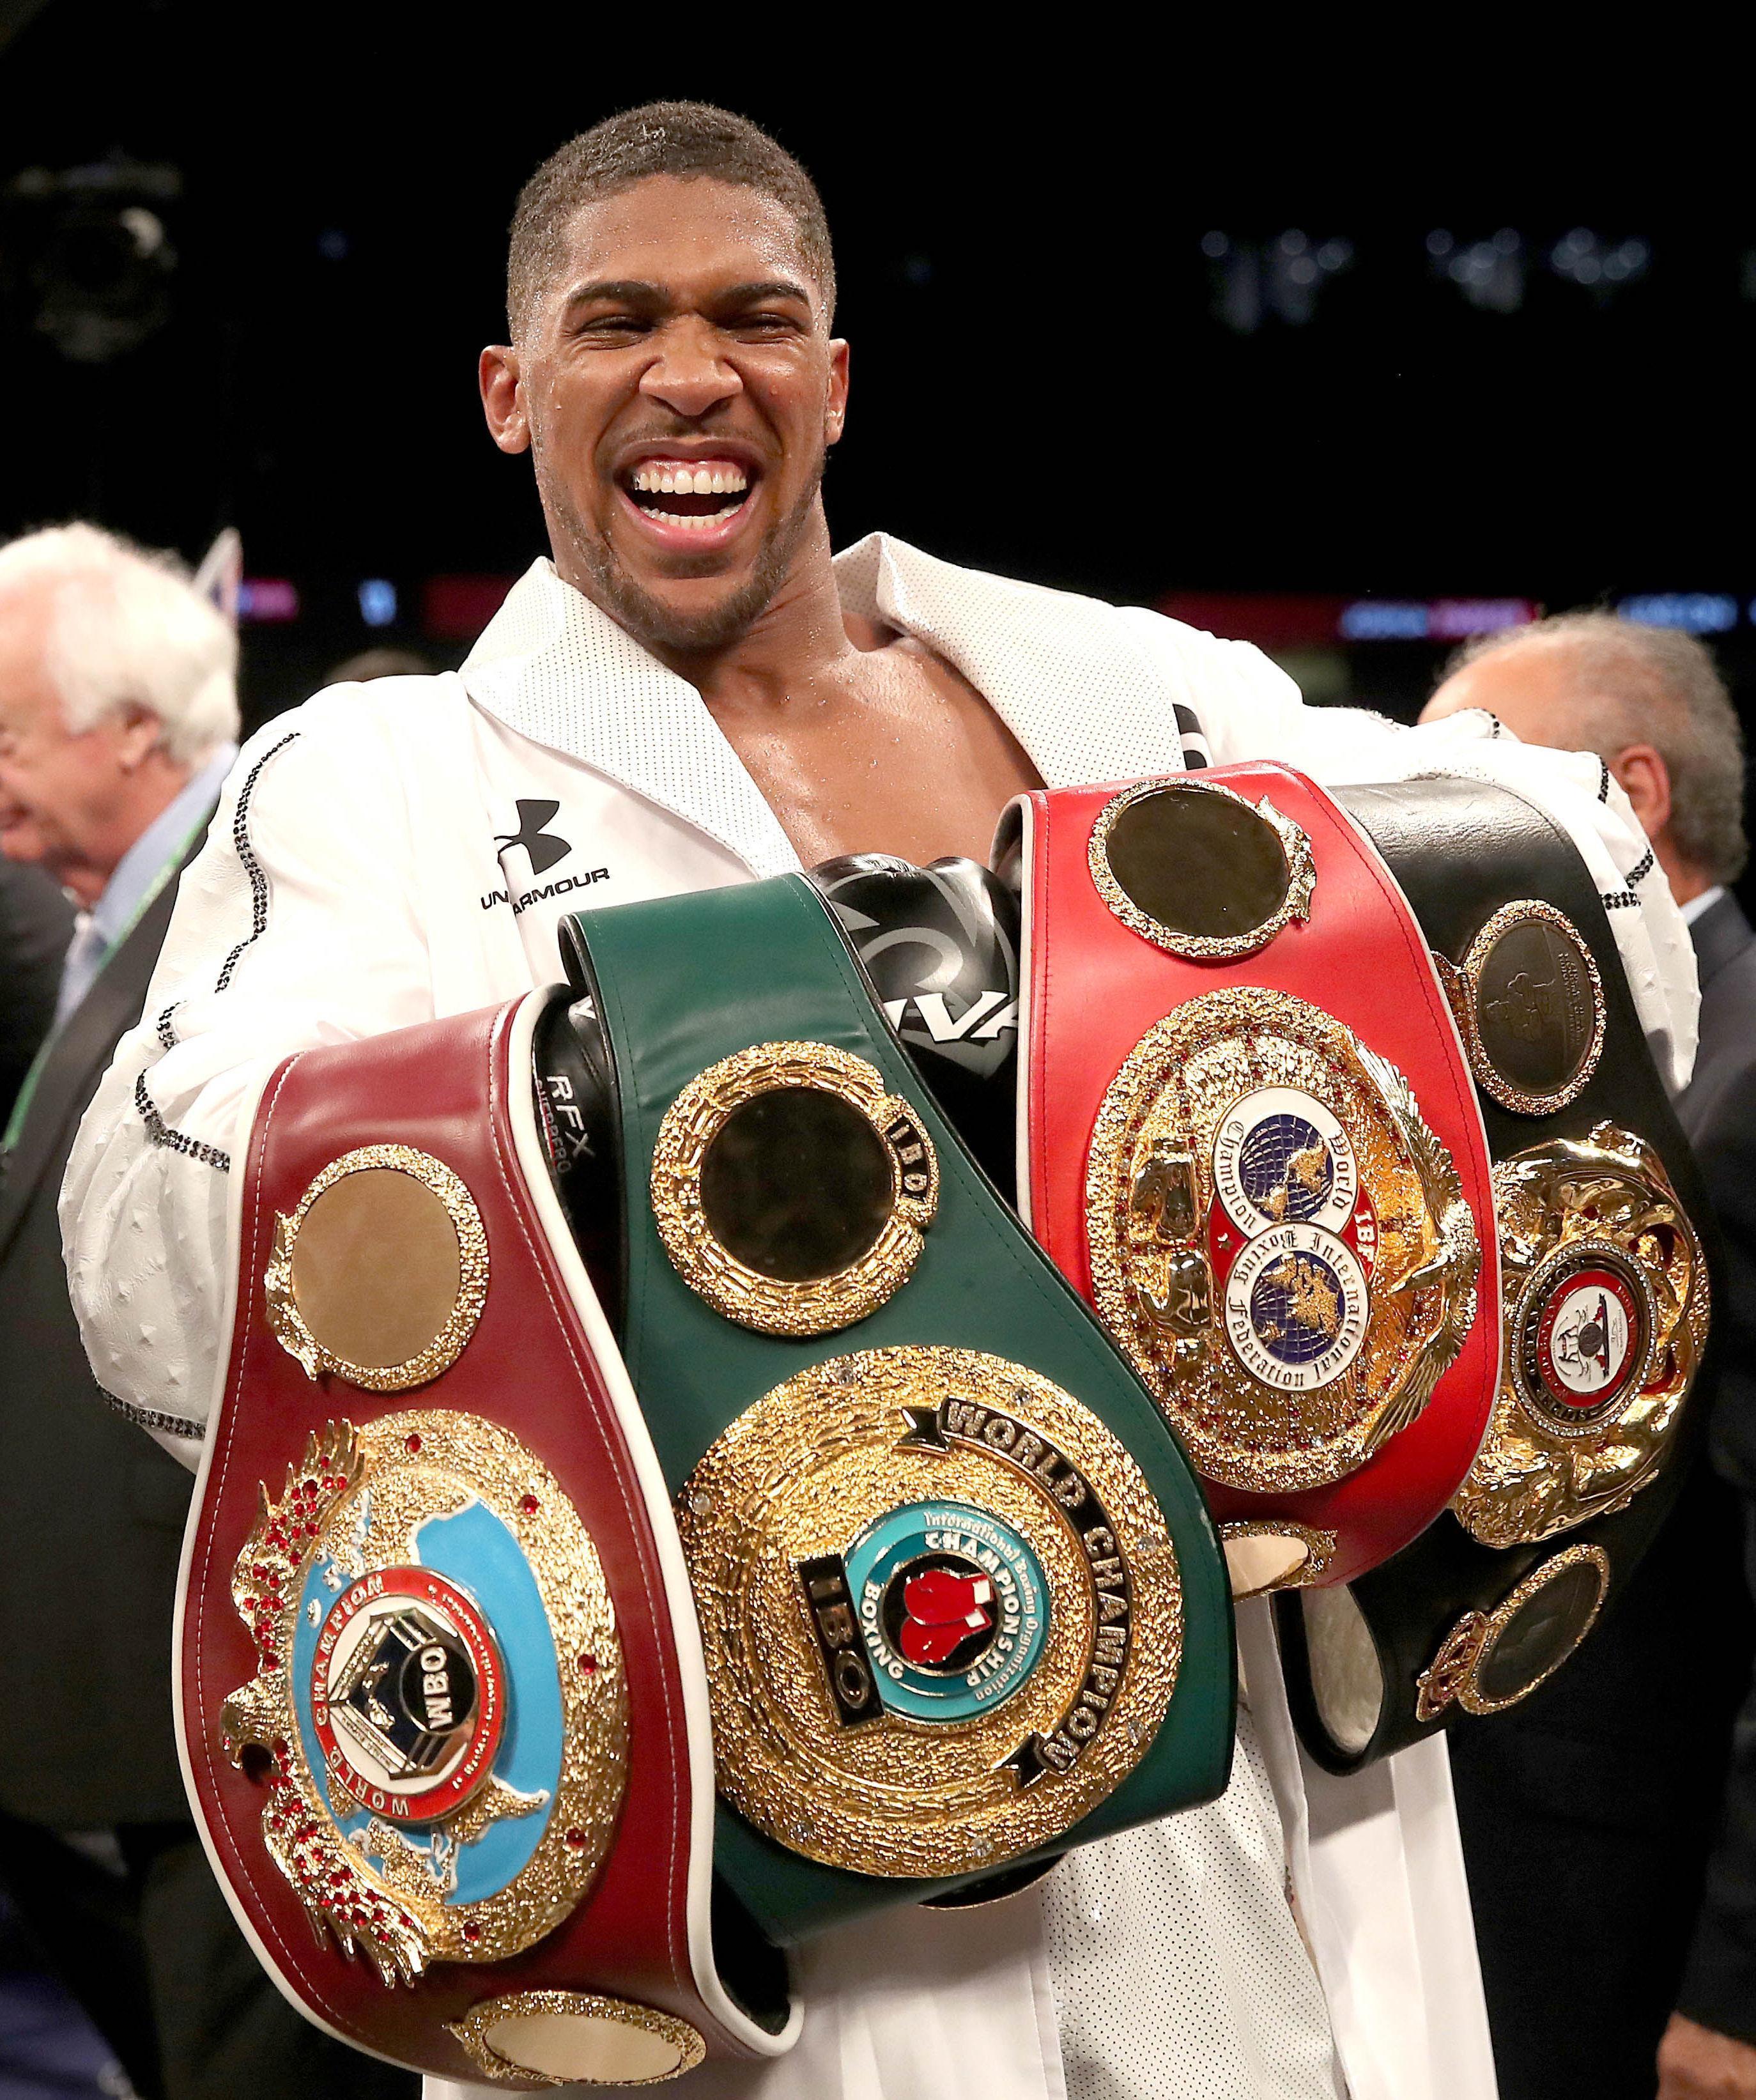 Joshua holds the WBA, WBO, IBF and IBO world titles